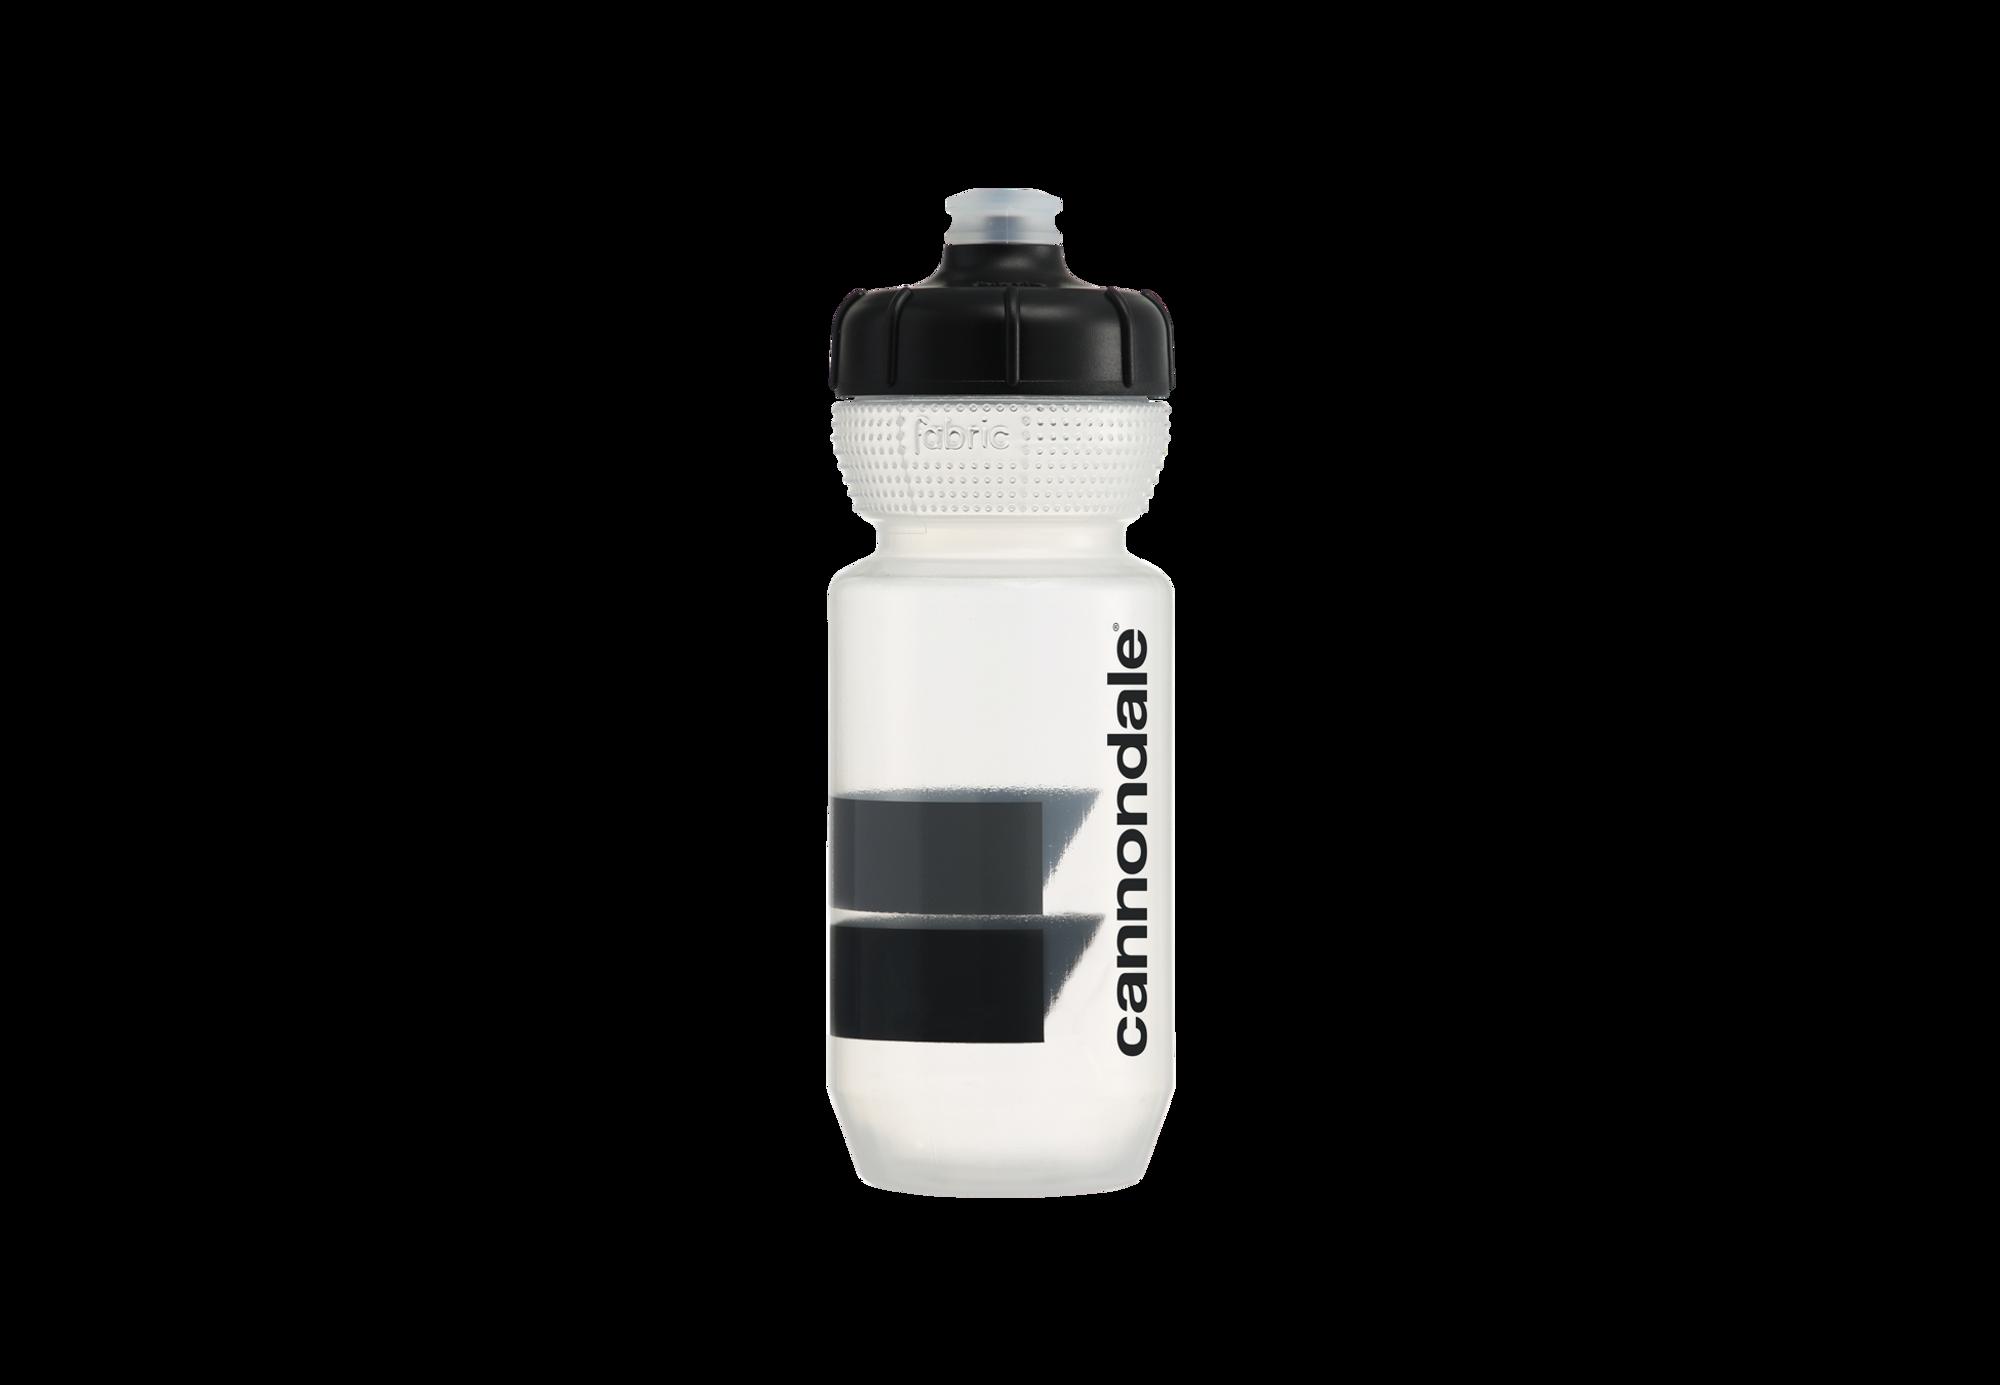 Gripper Block 600 ml Bottle Detail Image